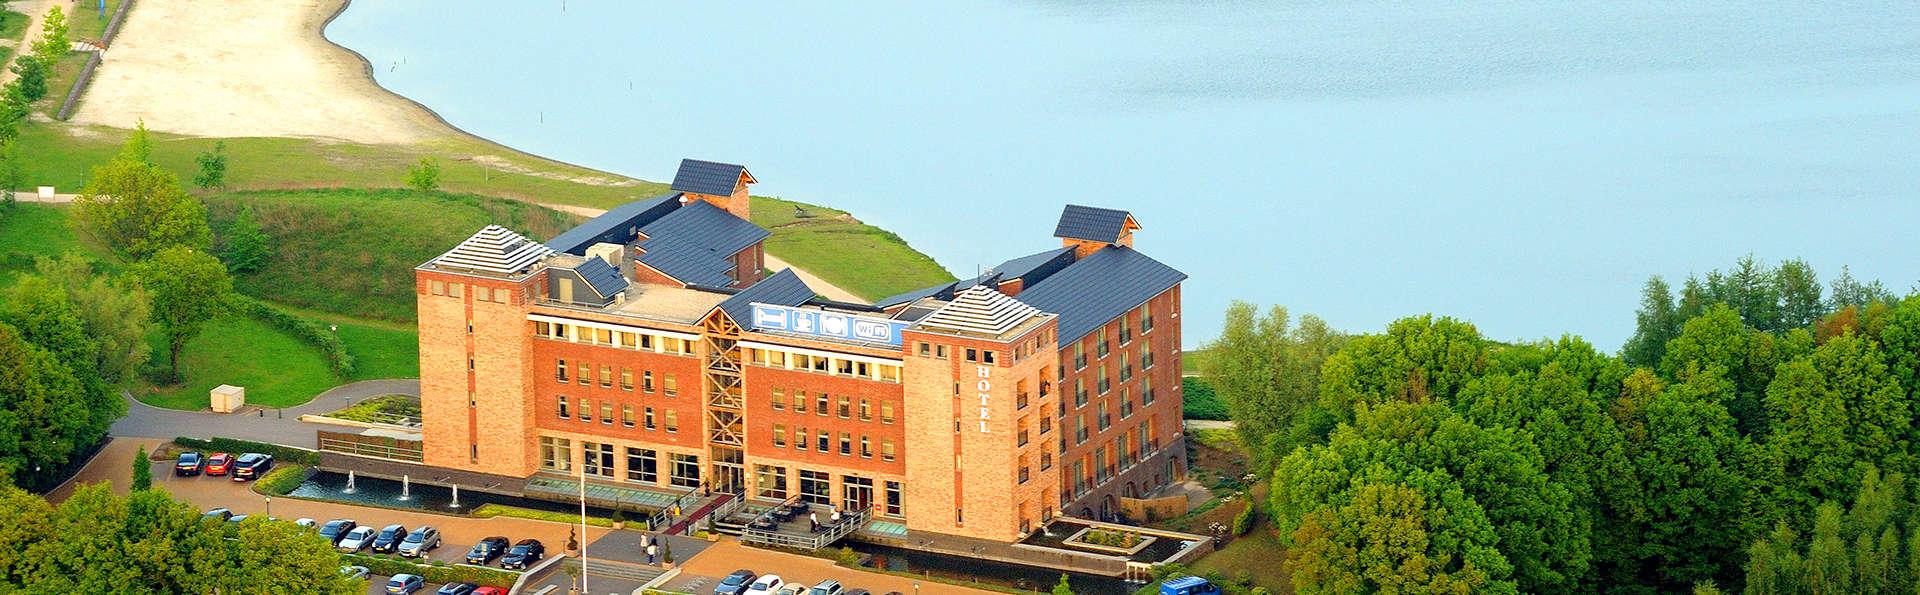 Parkhotel Horst - Venlo - EDIT_Exterior1.jpg